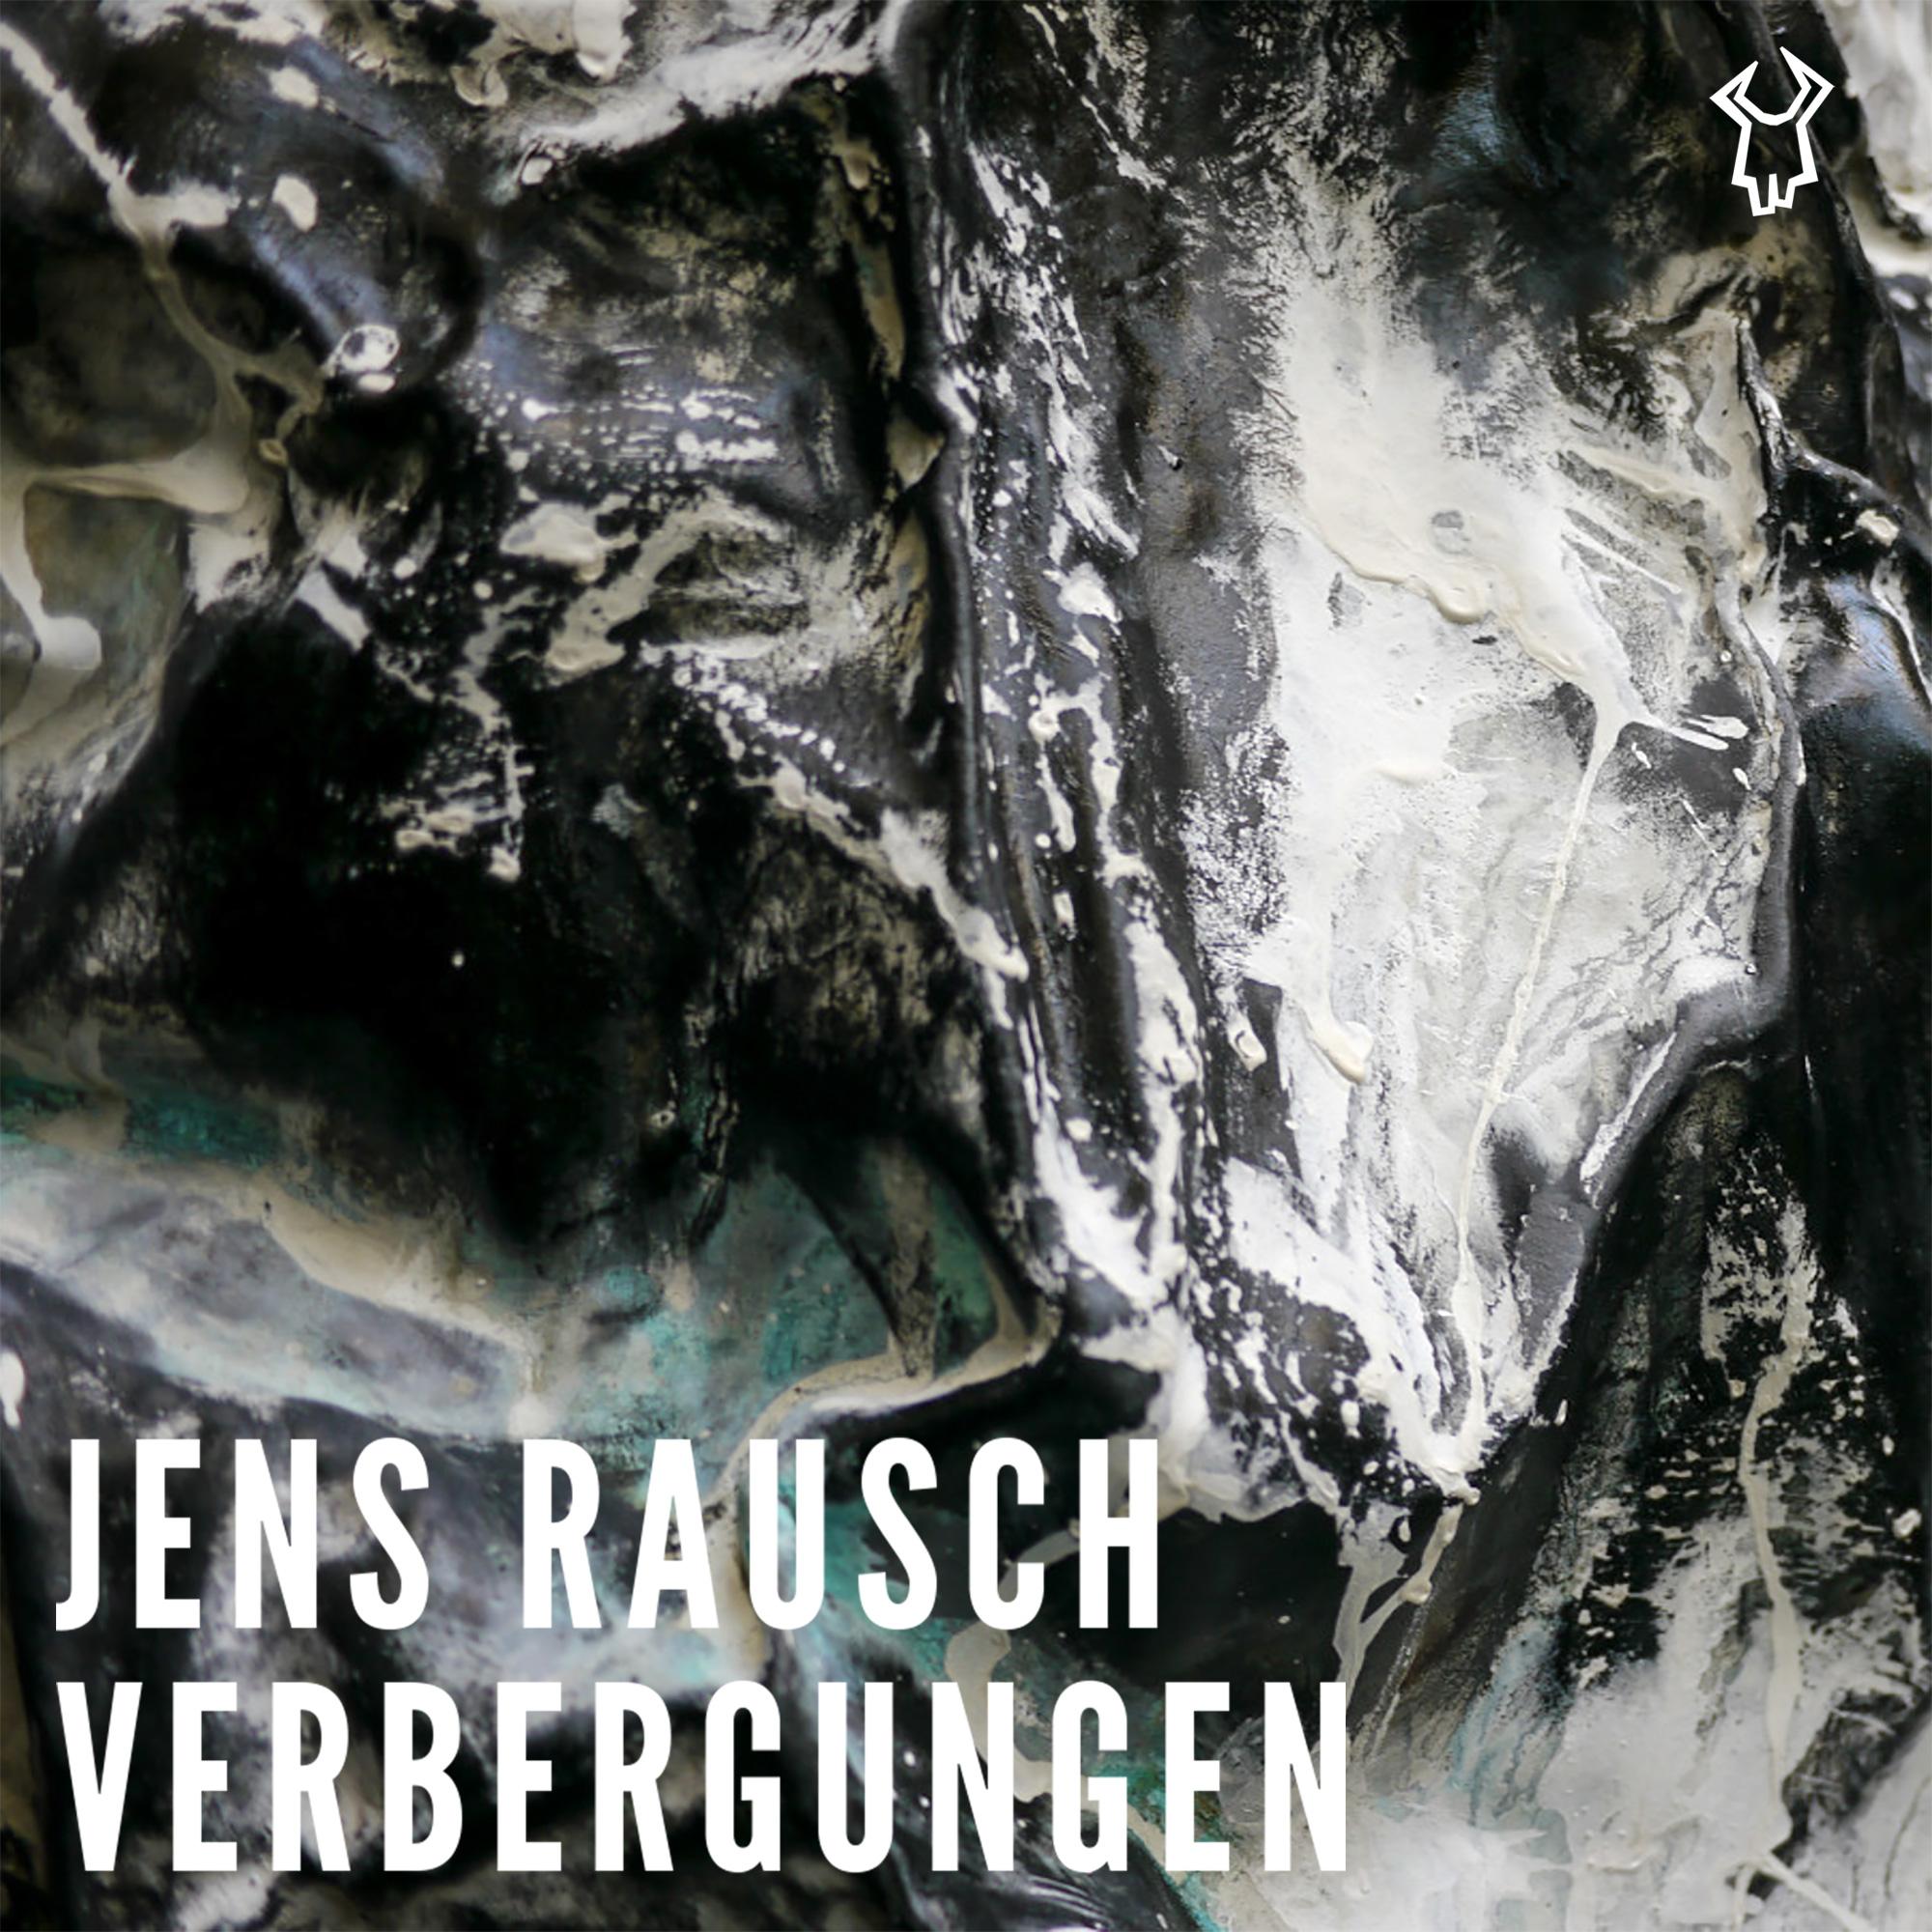 JENSRAUSCH_VERBERGUNGEN_FLYER_SQUARE.jpg